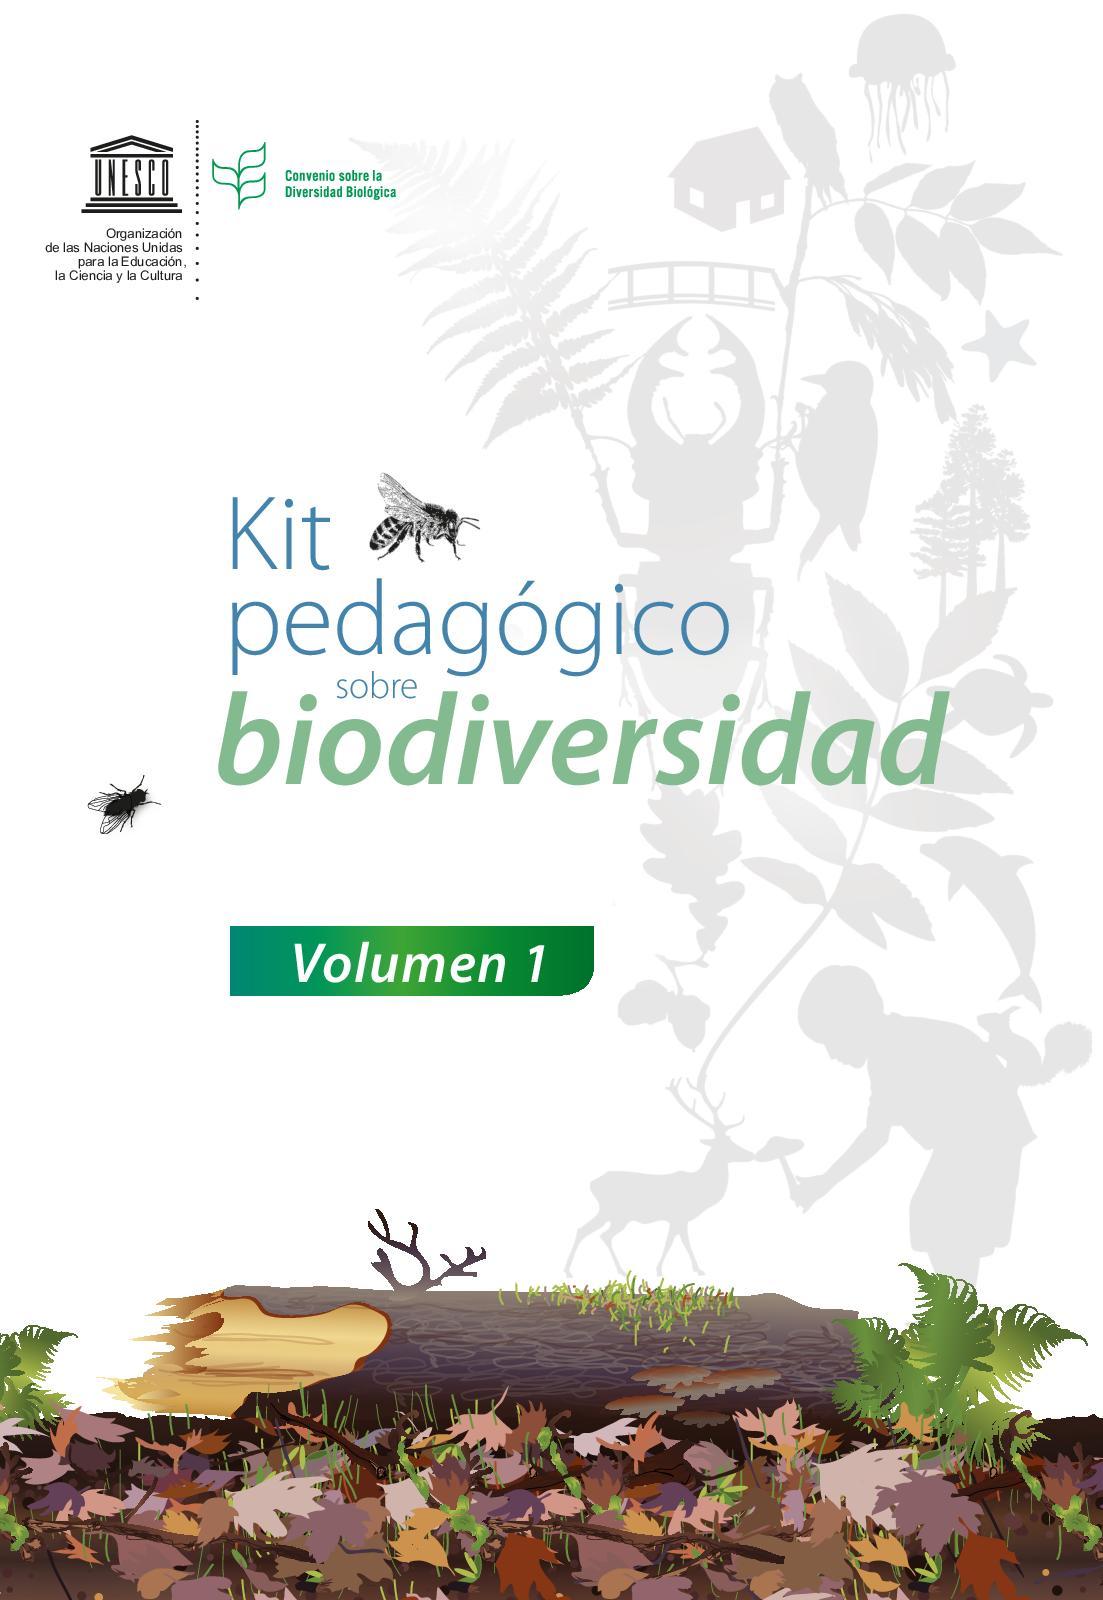 Calaméo - Kit pedagógico sobre biodiversidad, vol. I. (245983s)